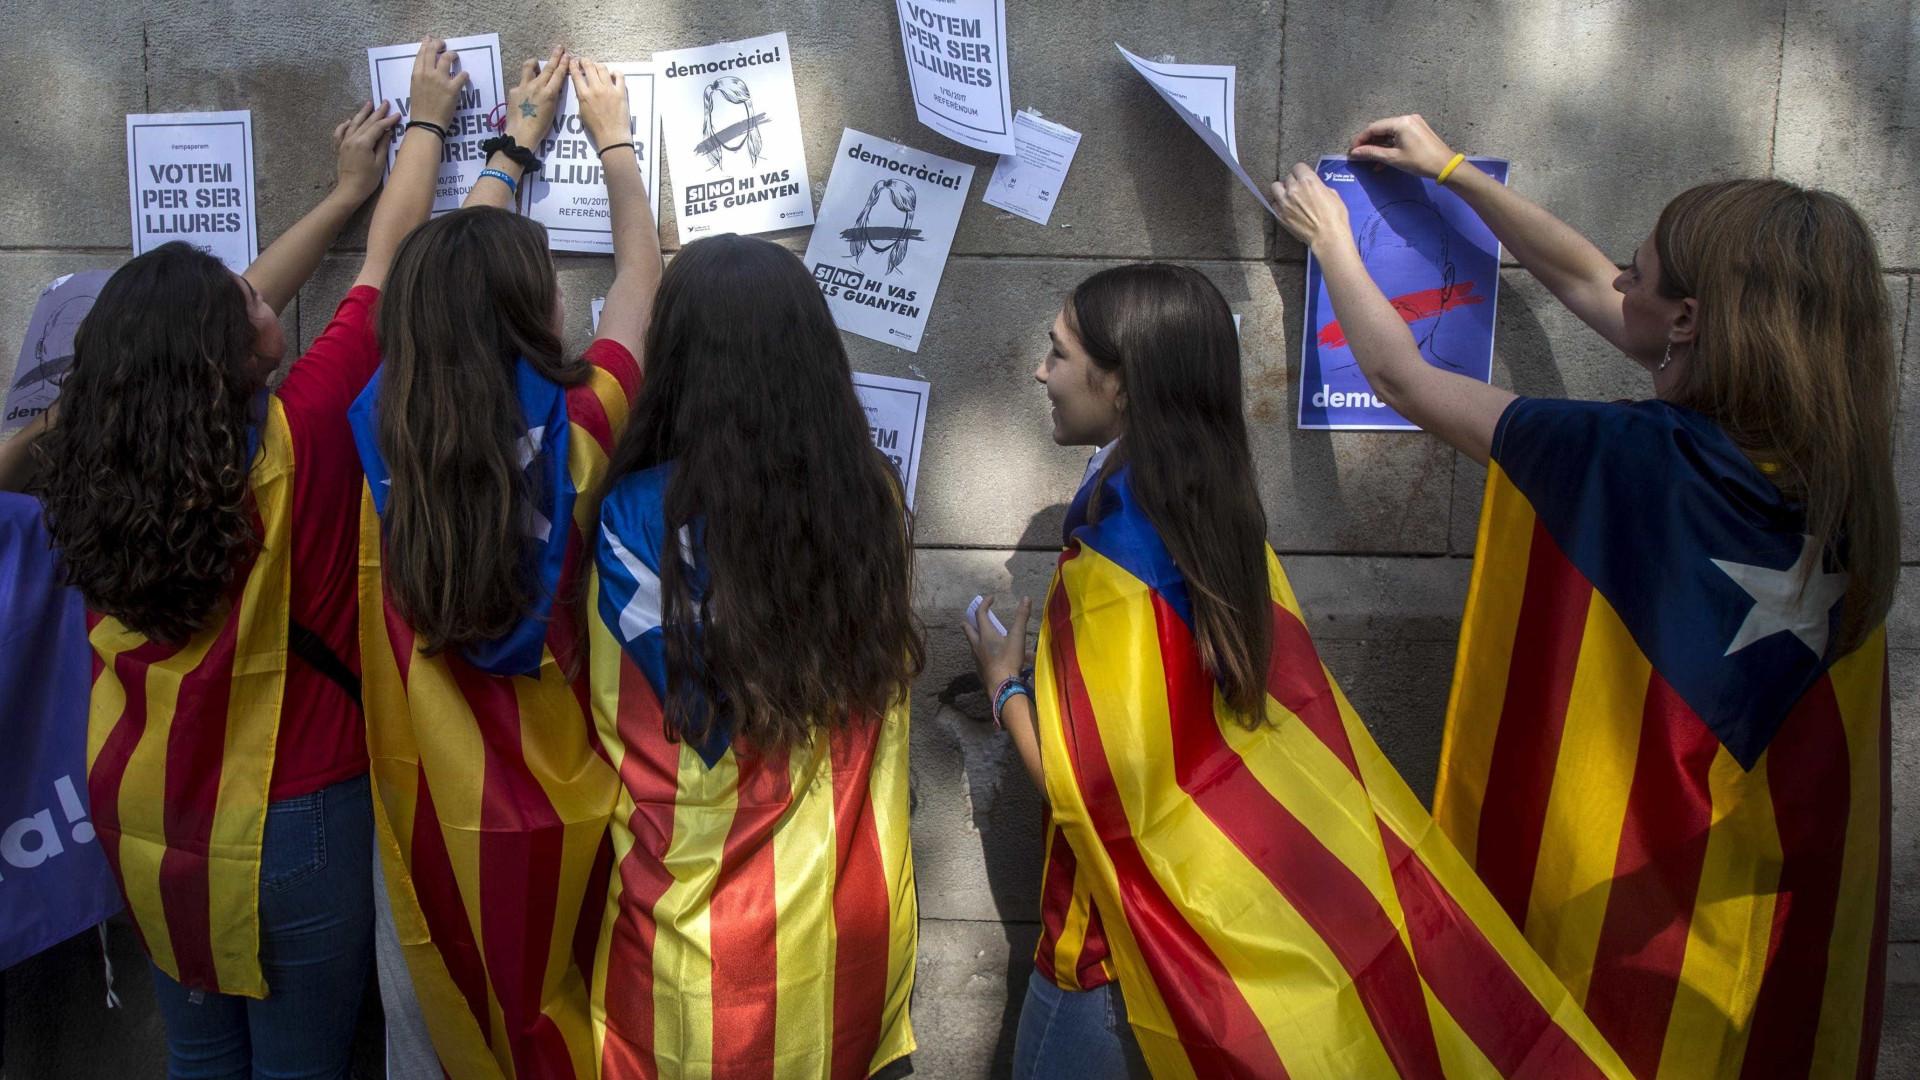 Rajoy recebe apoio de Trump contra referendo na Catalinha